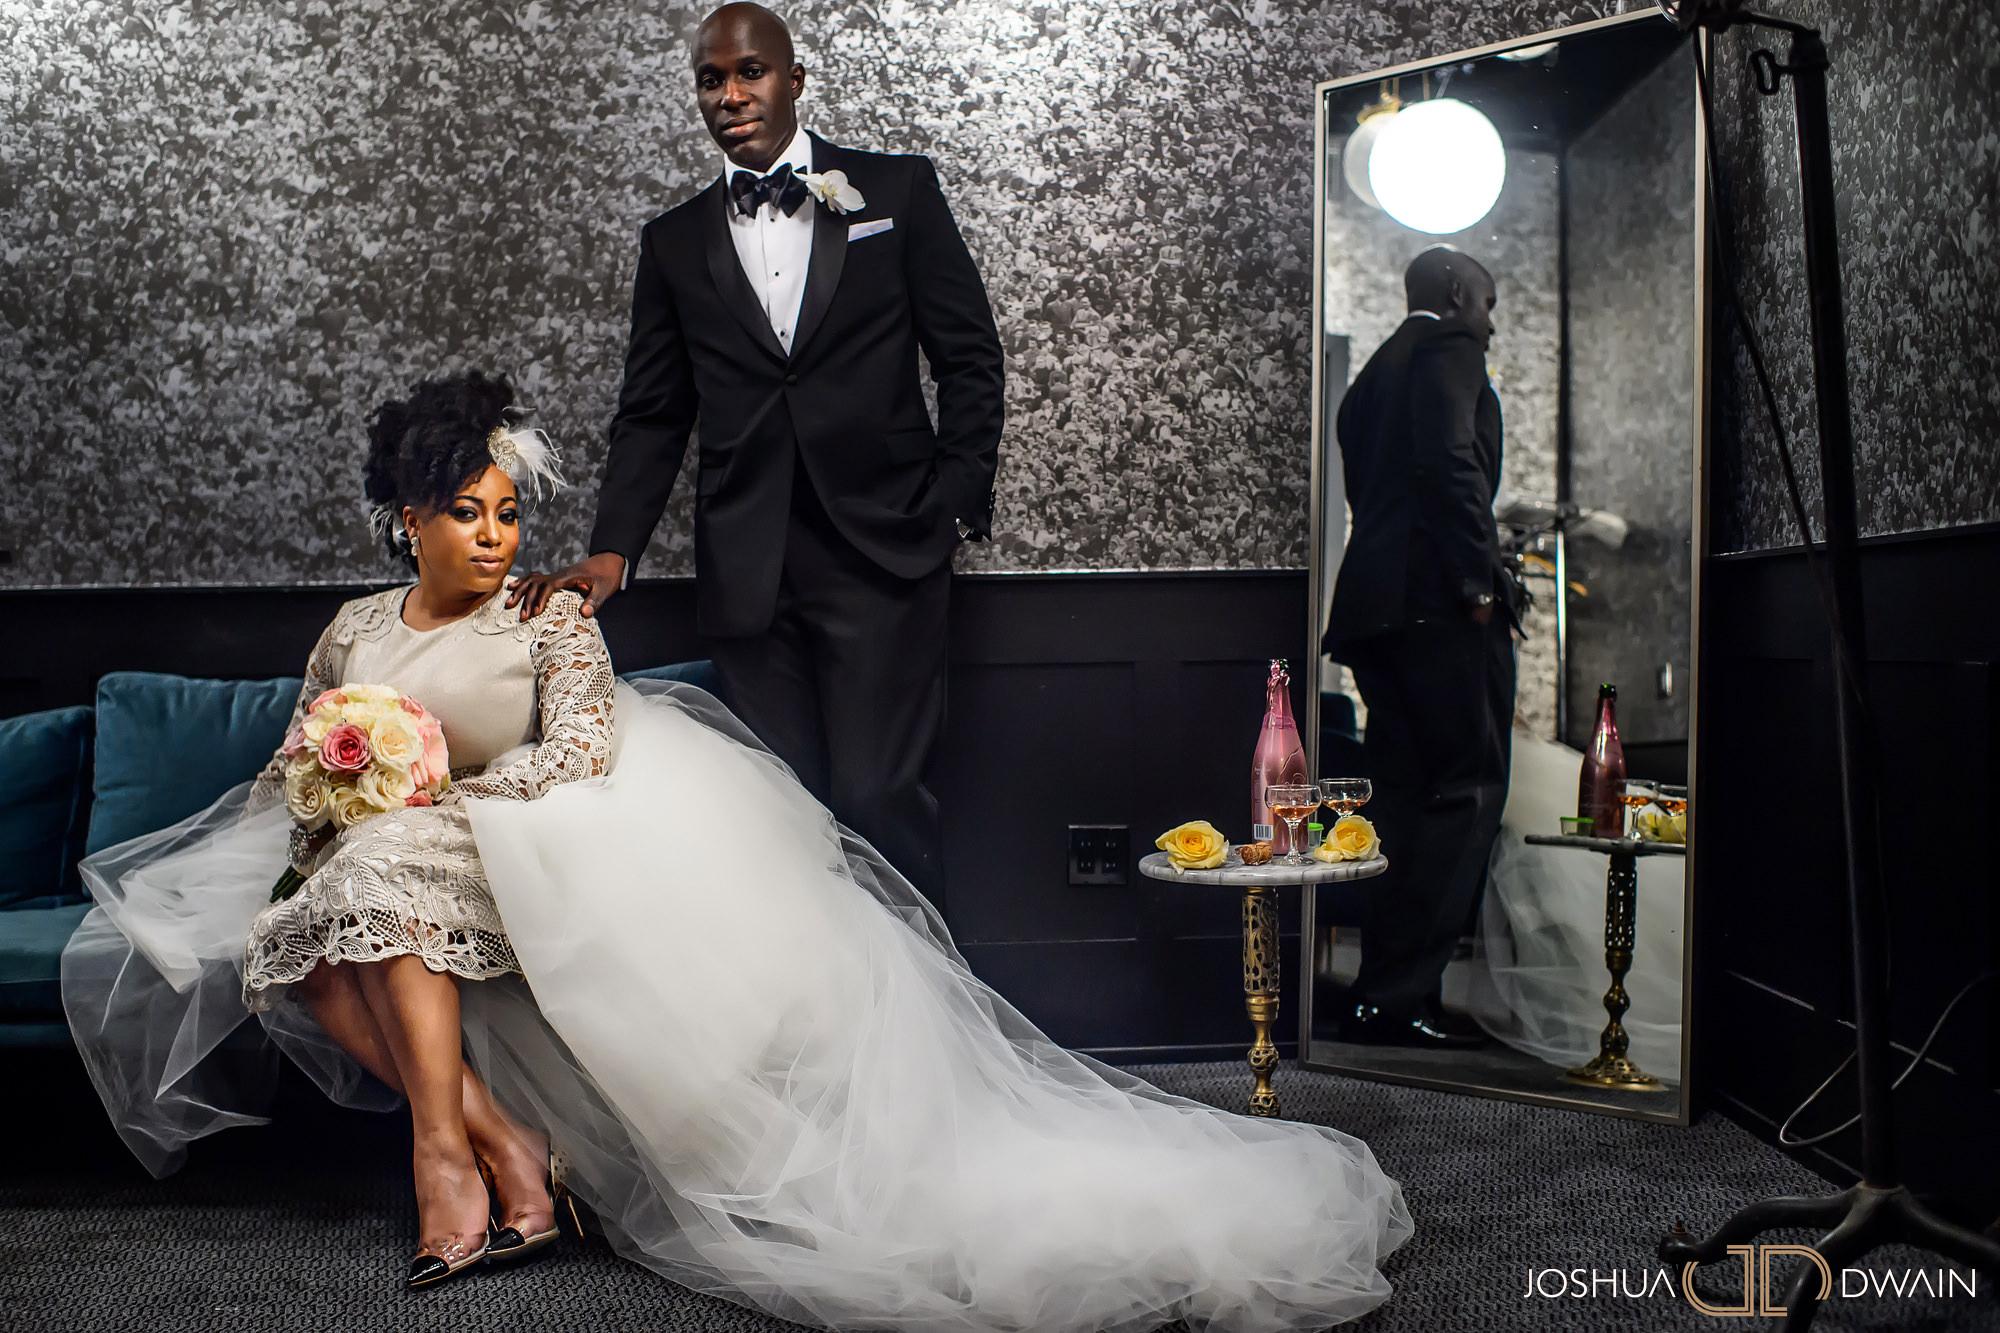 joshua-dwain-weddings-gallery-best-wedding-photographers-us-001